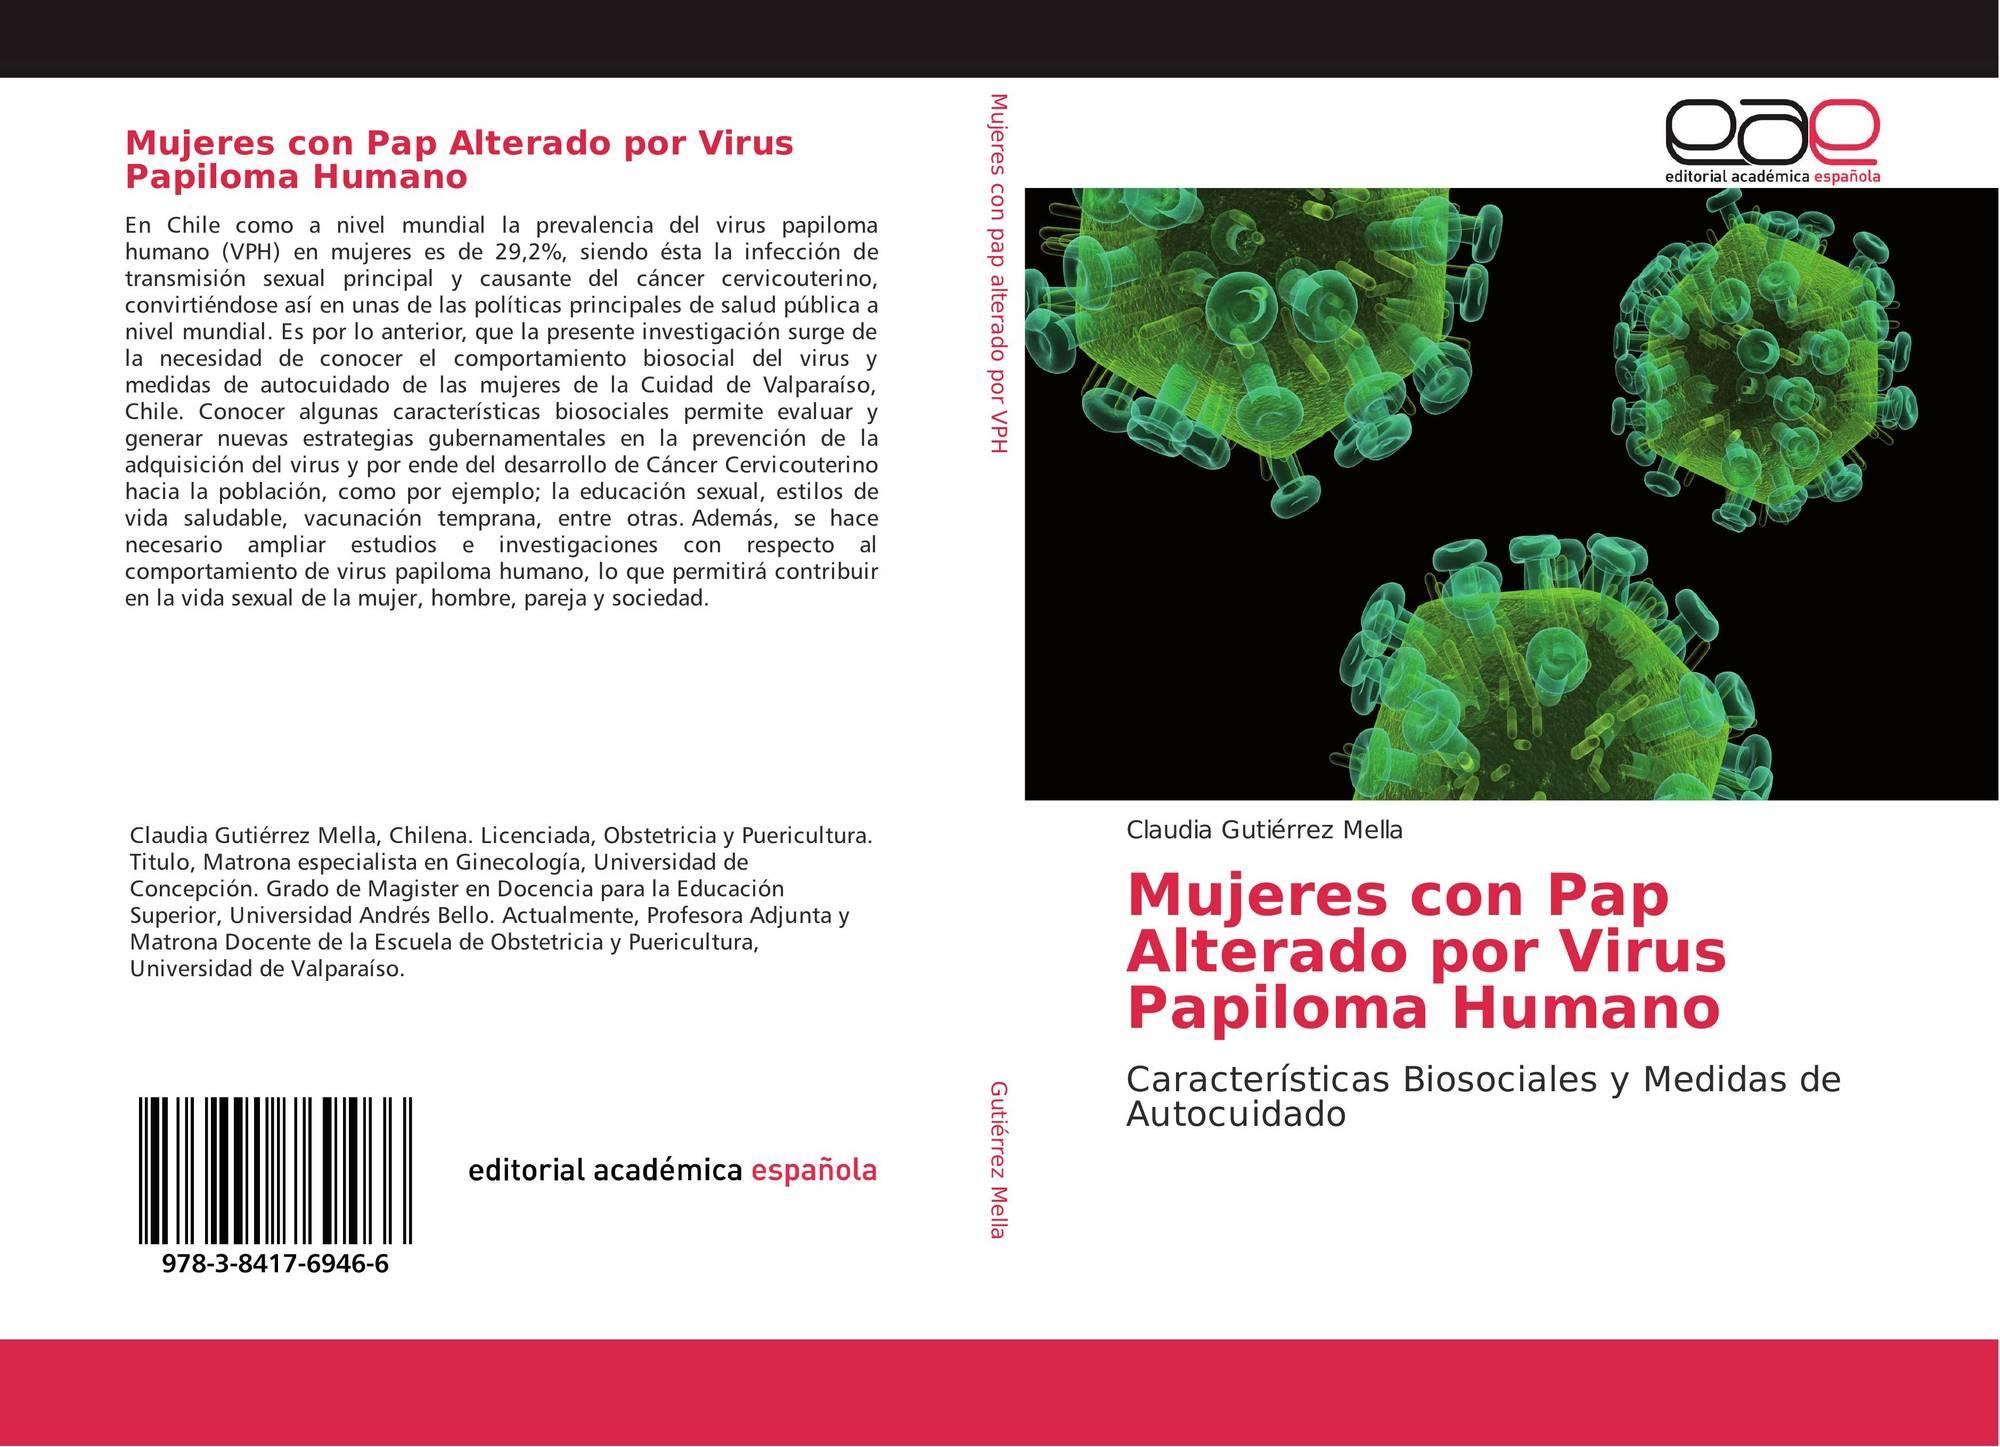 ano ang human papilloma virus hpv contagio por saliva